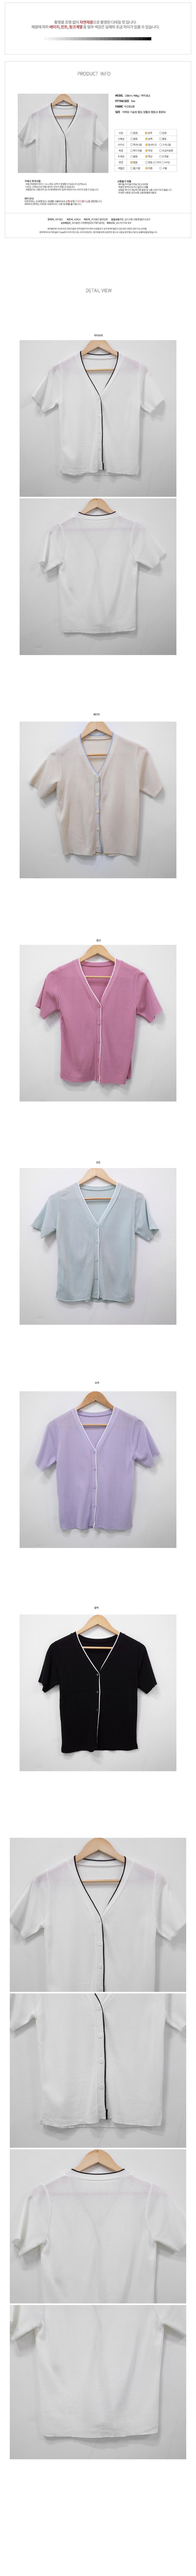 Mono Color Button Knitwear Cardigan